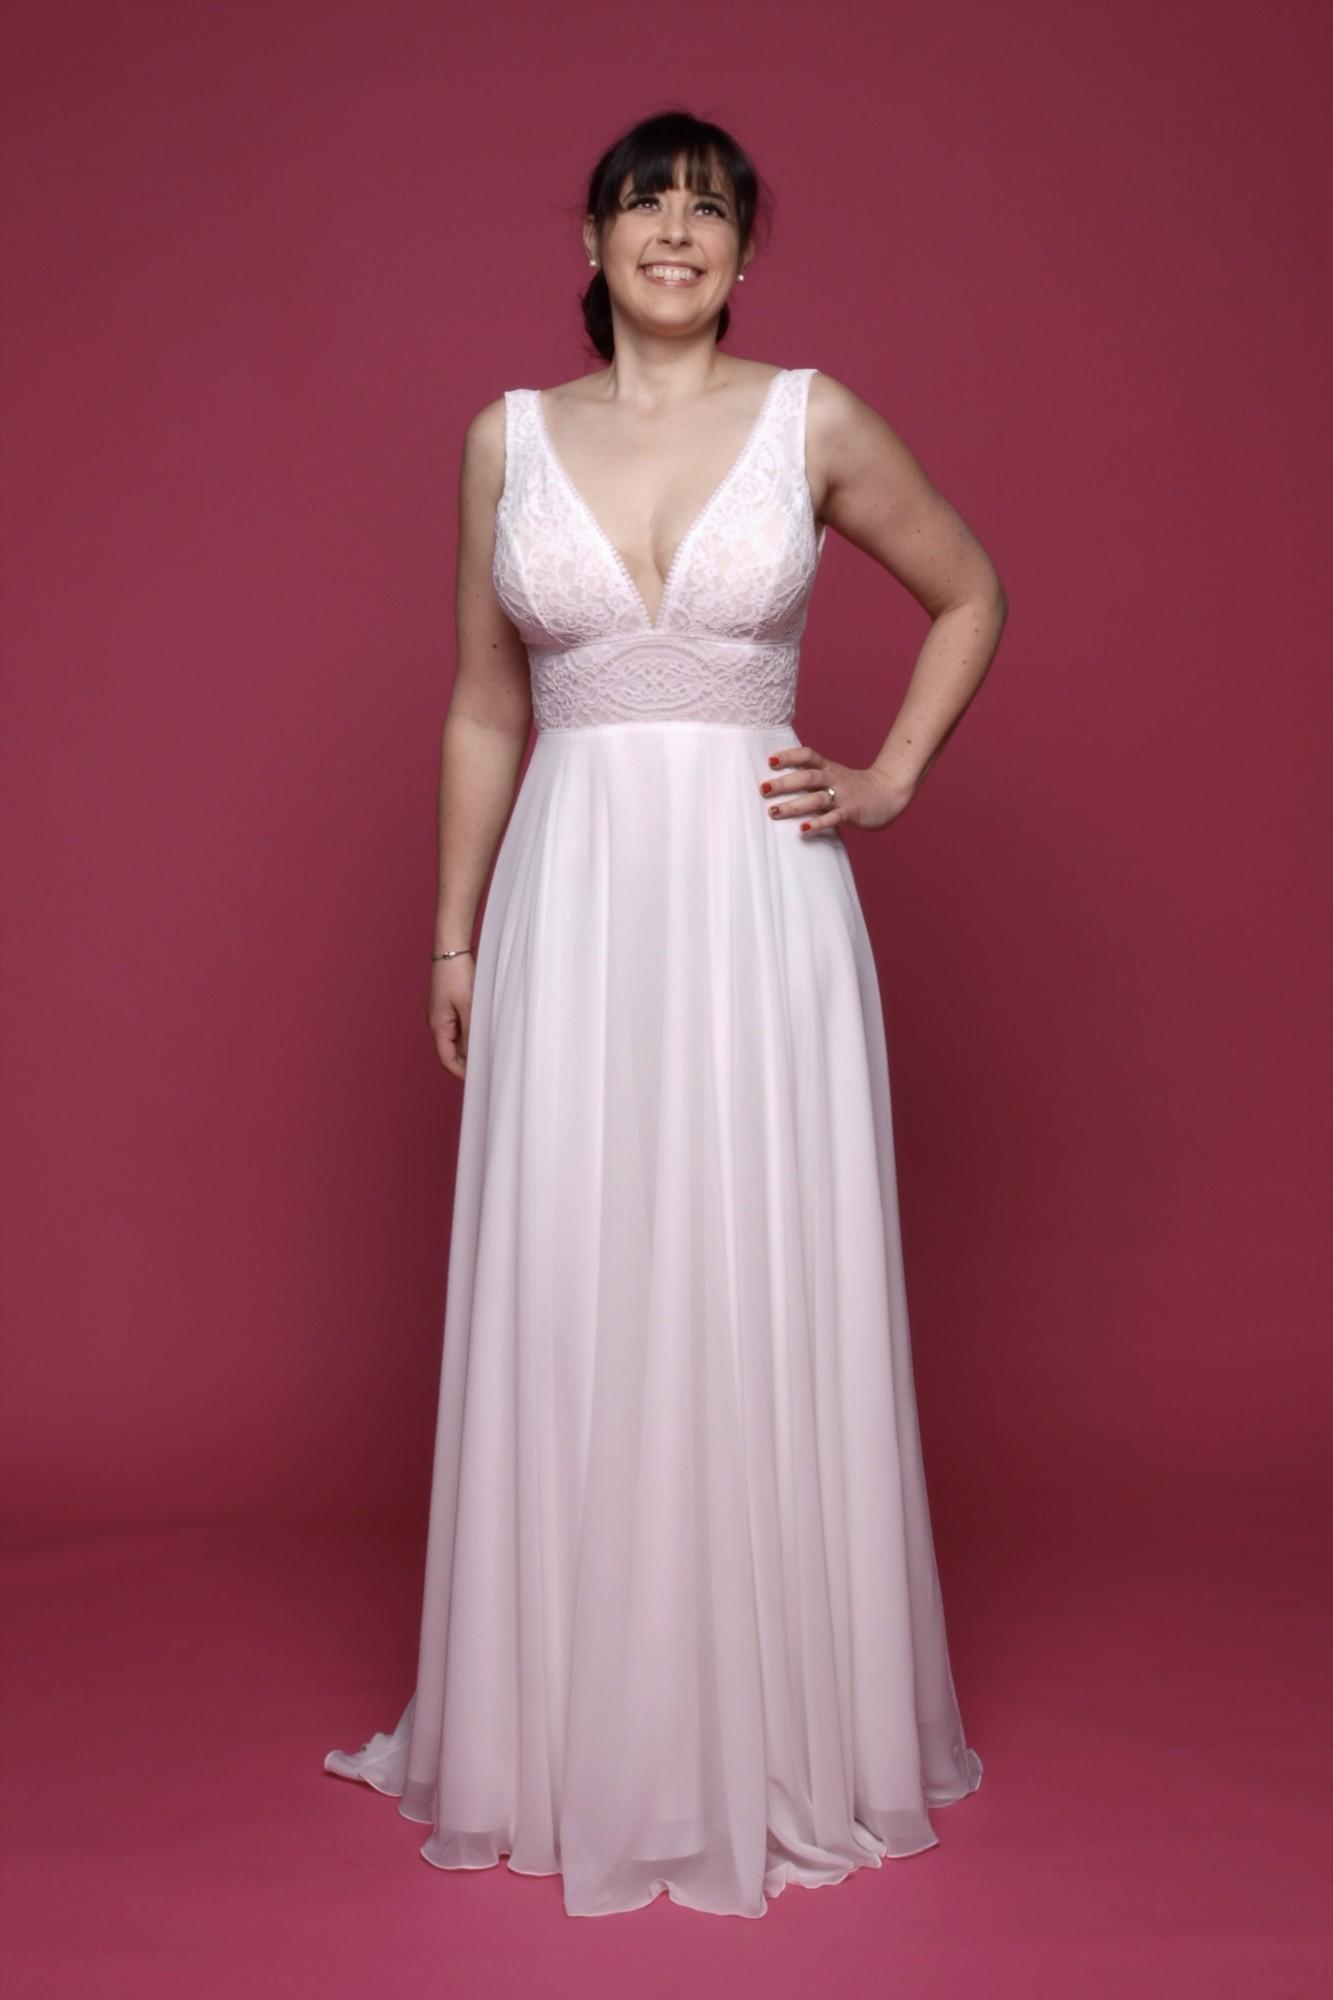 Robe de Coeur - Robe de mariée - Albi - Tarn - robe neuve - petit budget - bianco évent